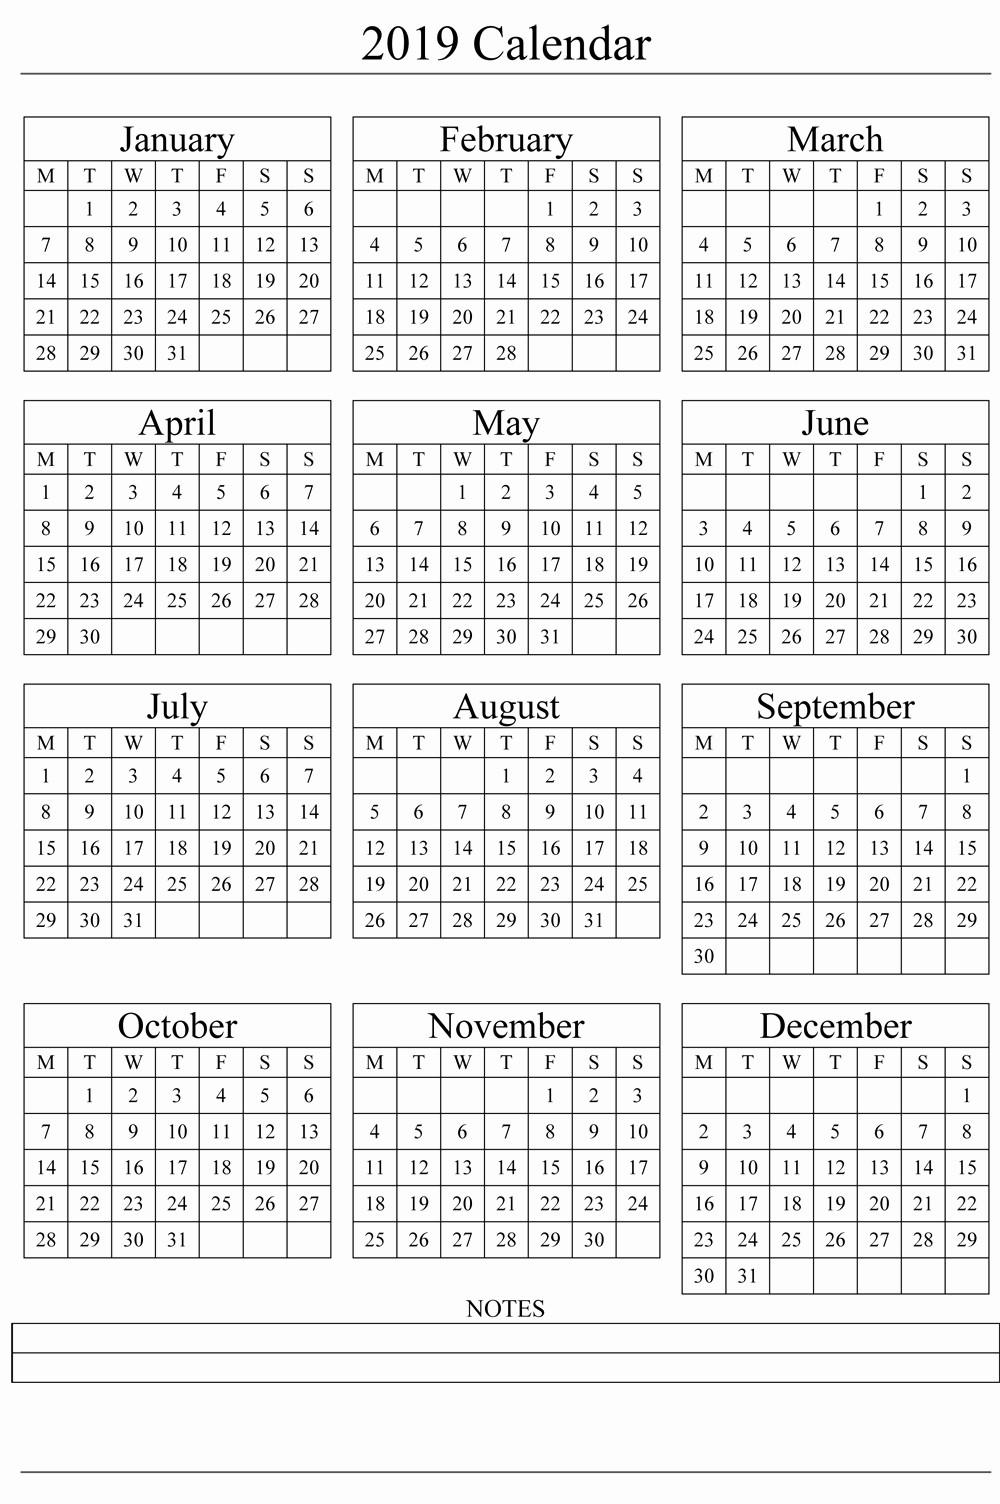 Free Printable Weekly Calendar 2019 Elegant 2019 Printable Calendar Templates [free]